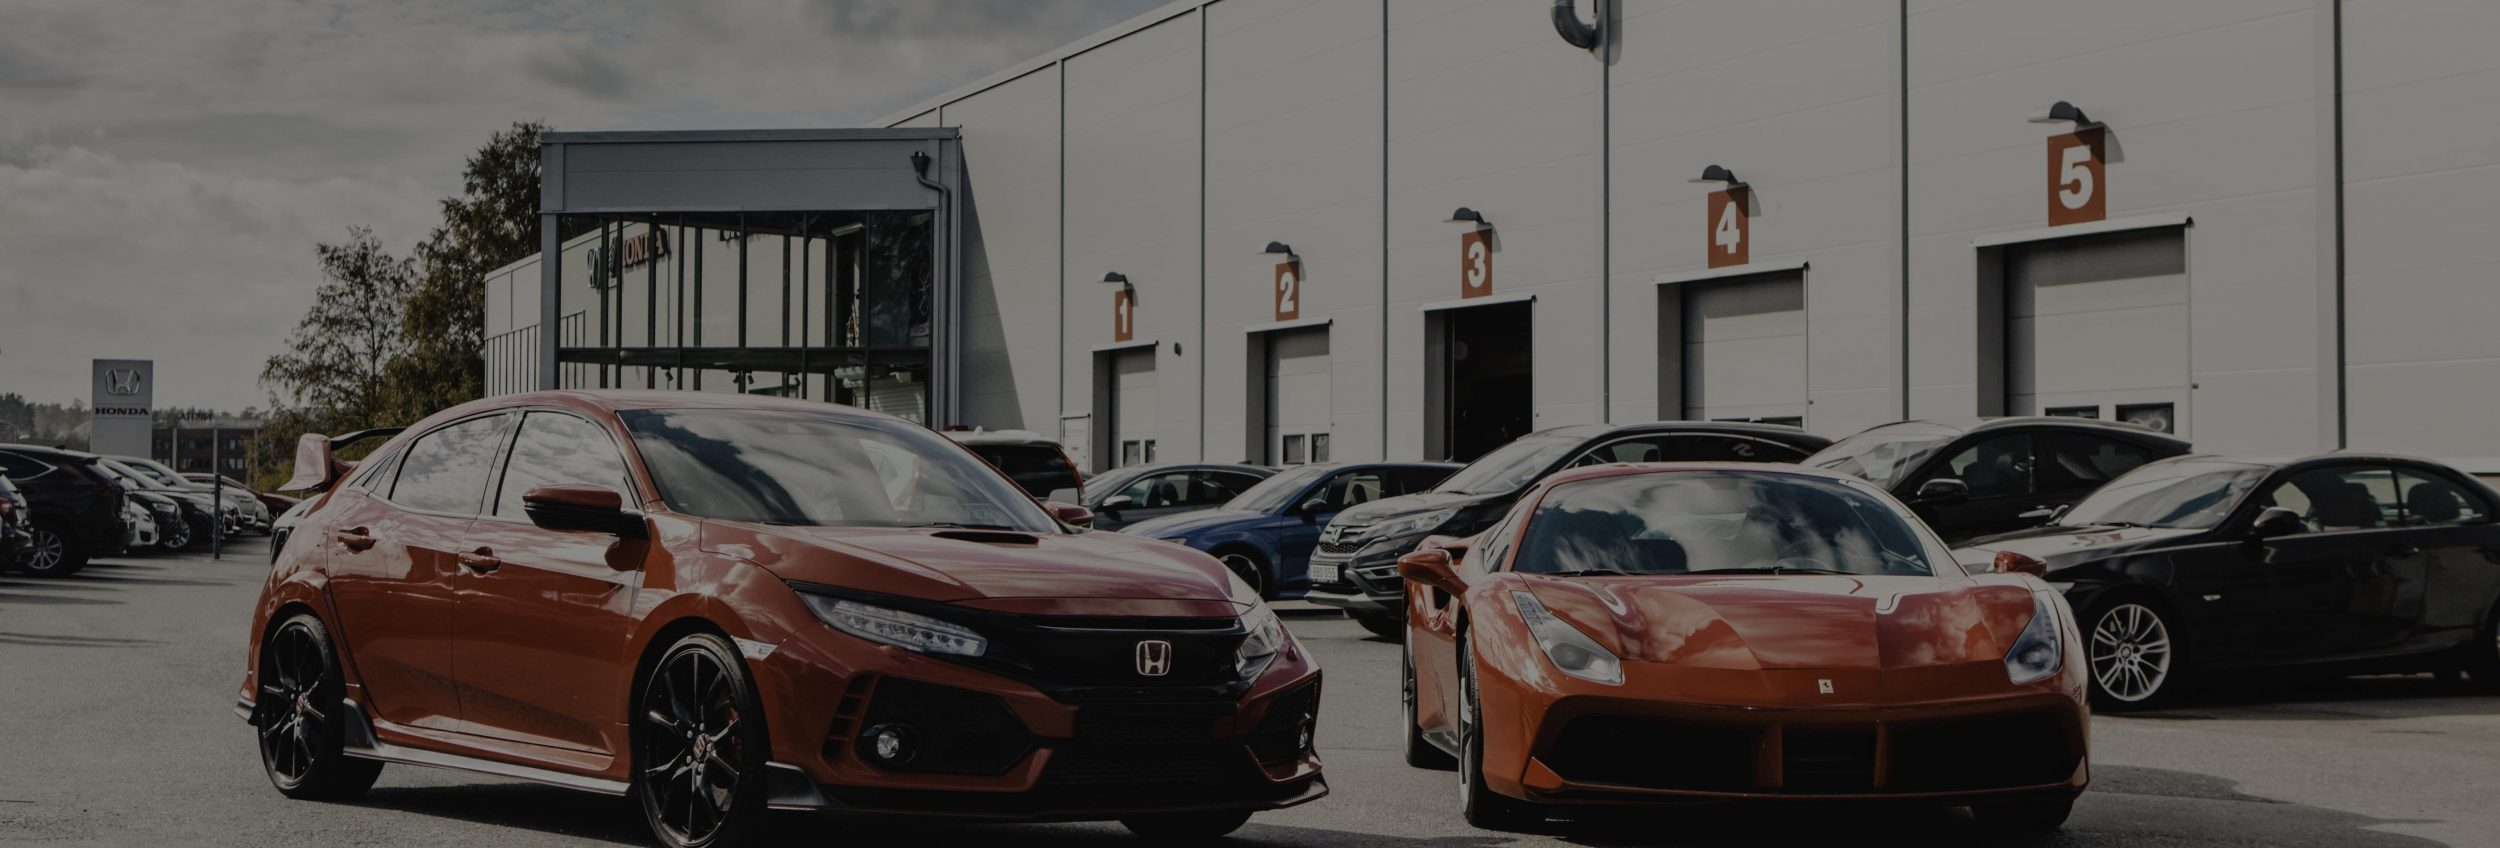 Bilar Fordonsbolaget